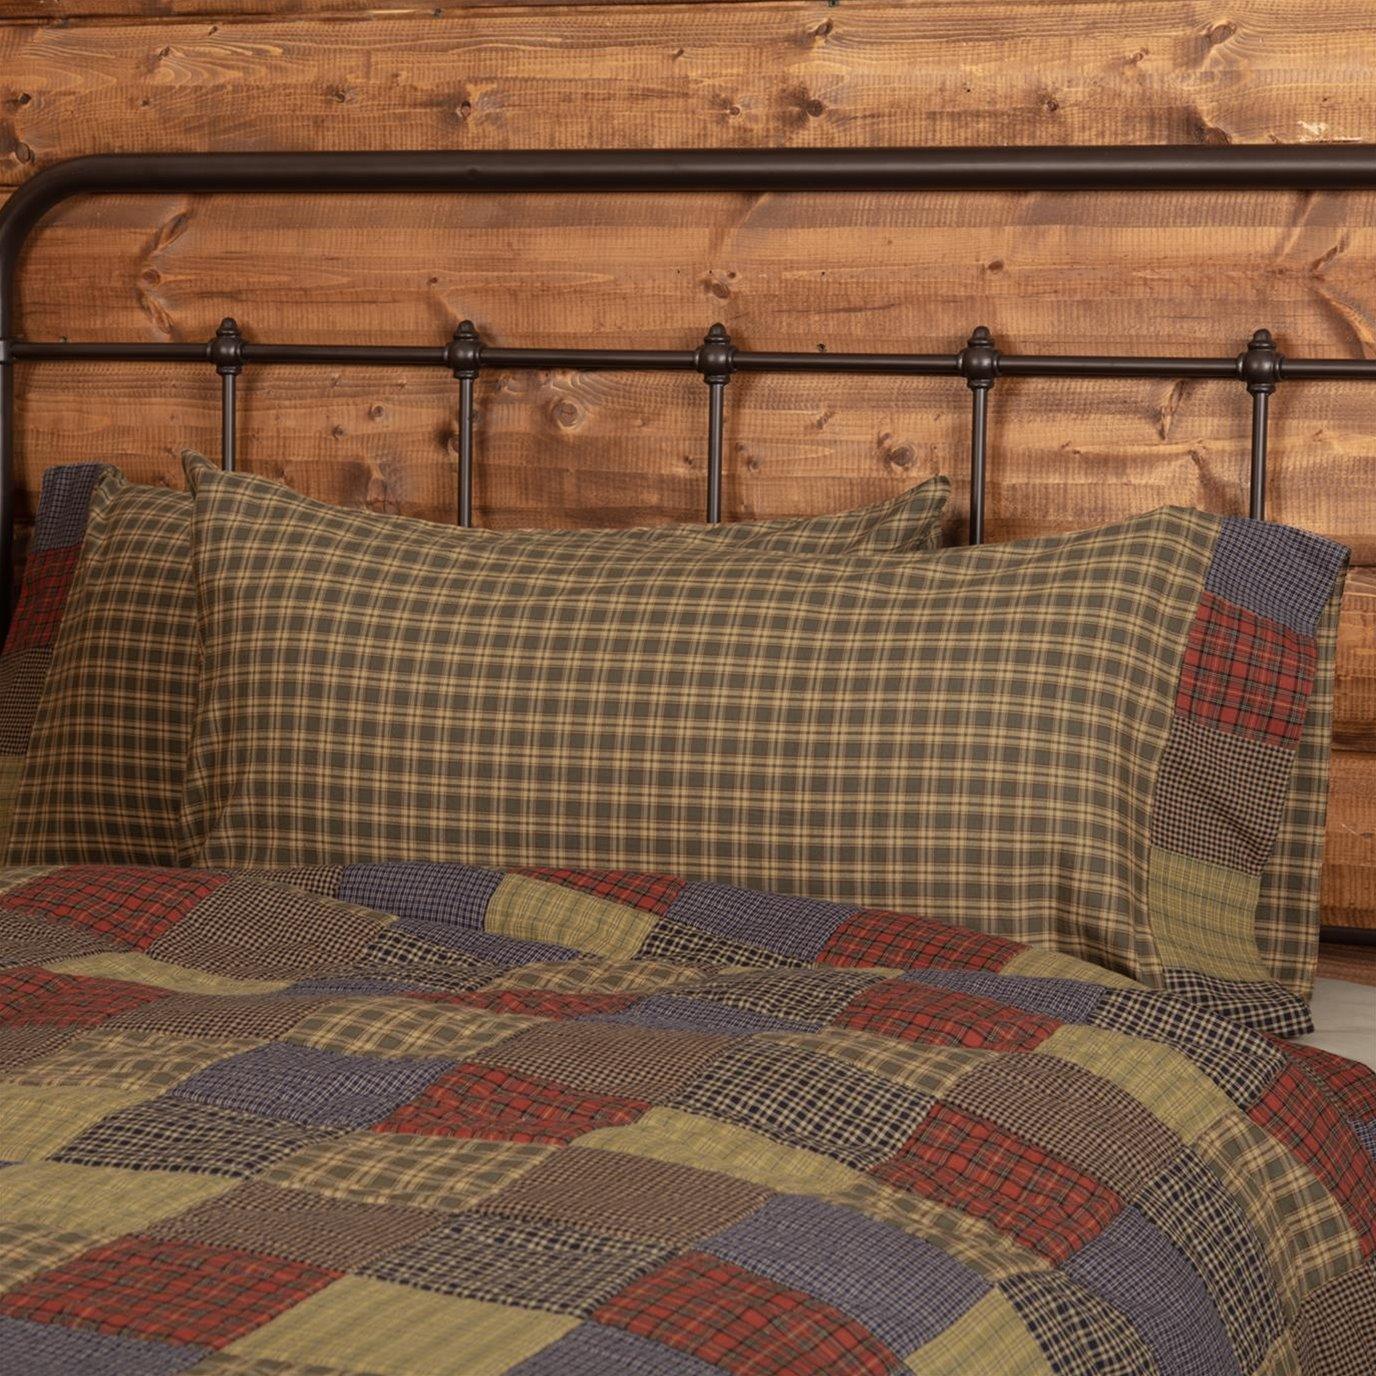 Cedar Ridge King Pillow Case with Block Border Set of 2 21x40